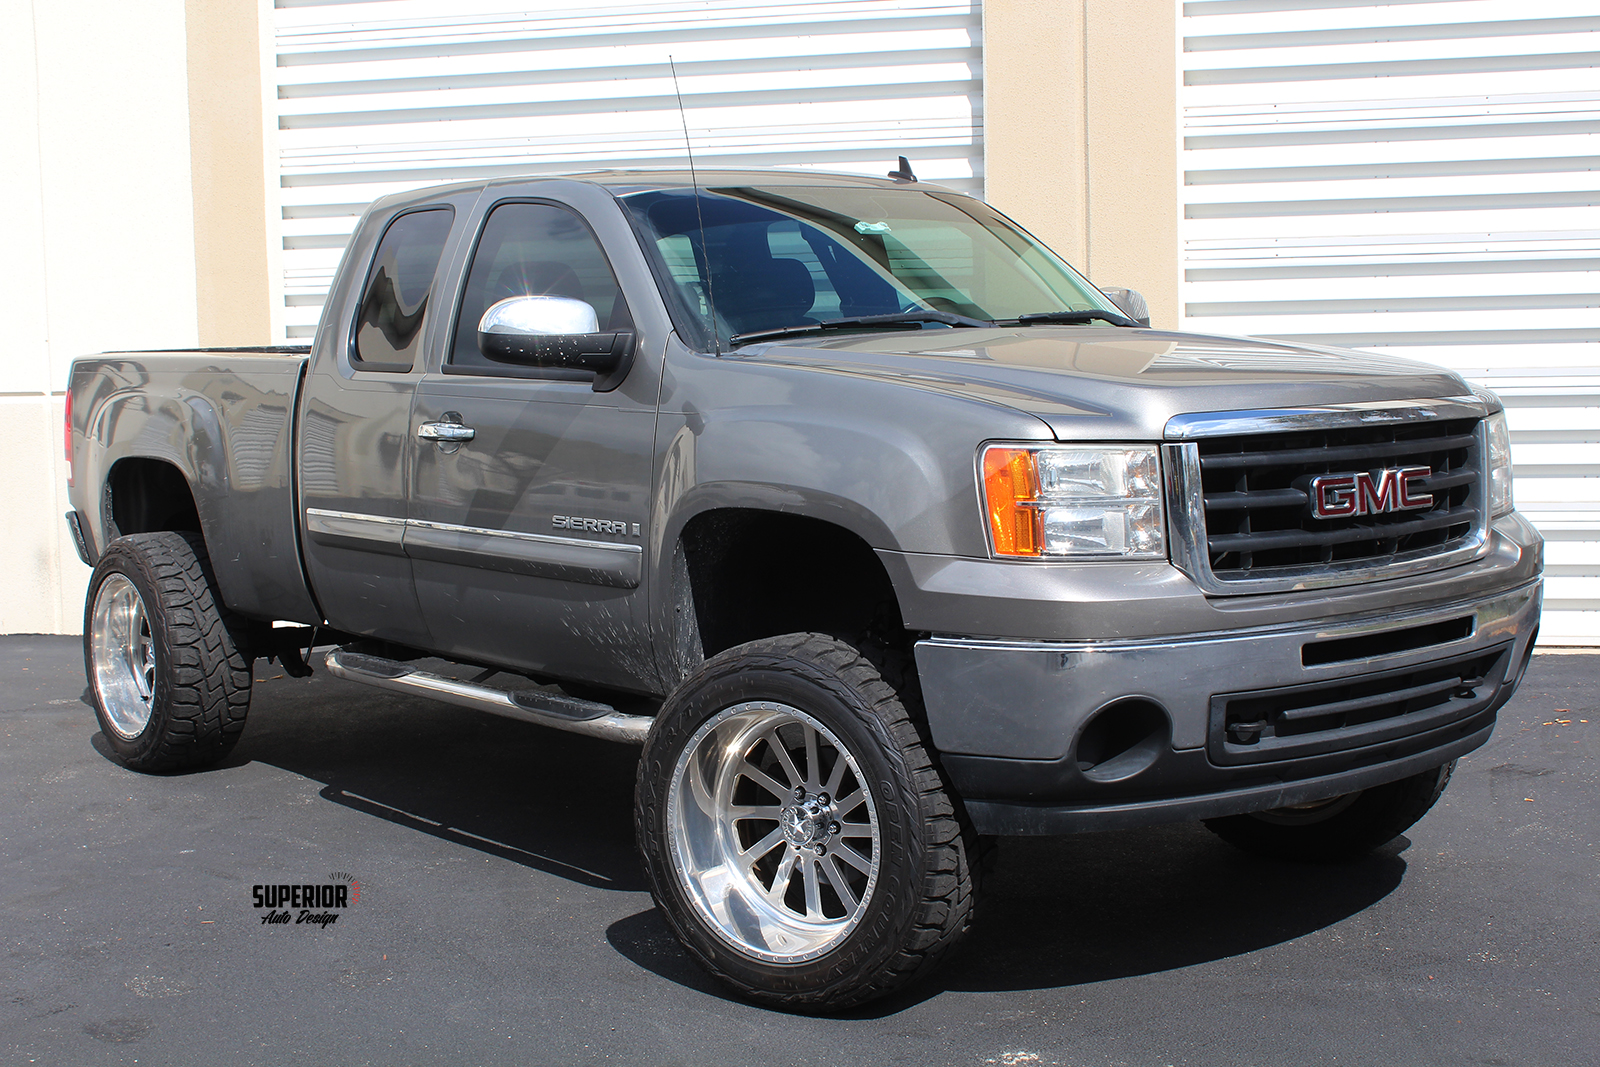 sierra lifted truck superior auto design 1